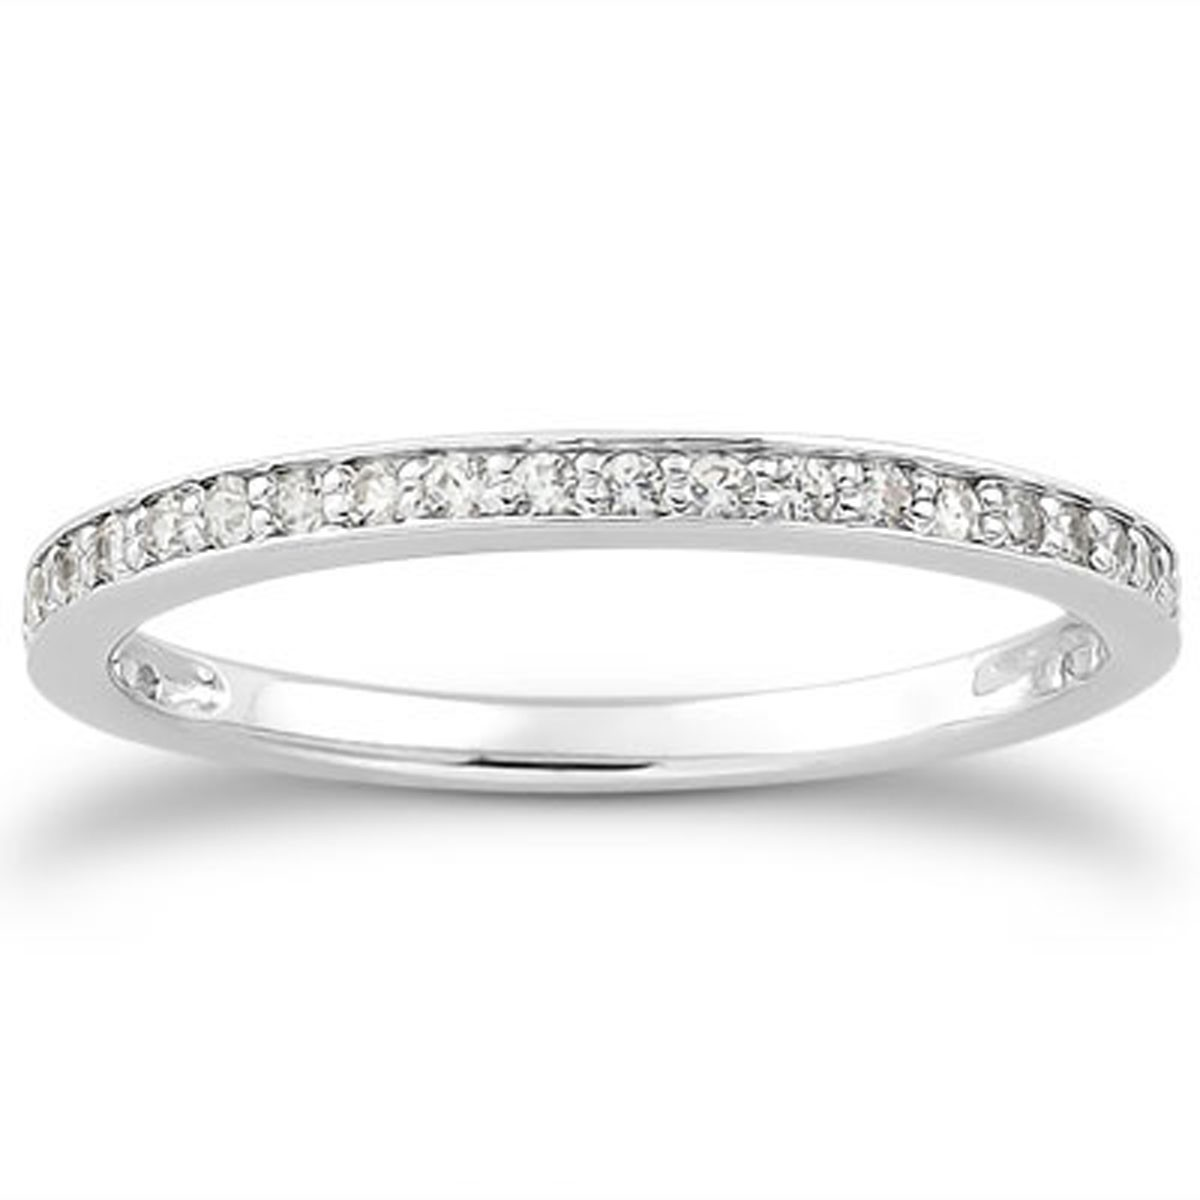 Diamond Micro-pave Wedding Ring Band In 14K White Gold